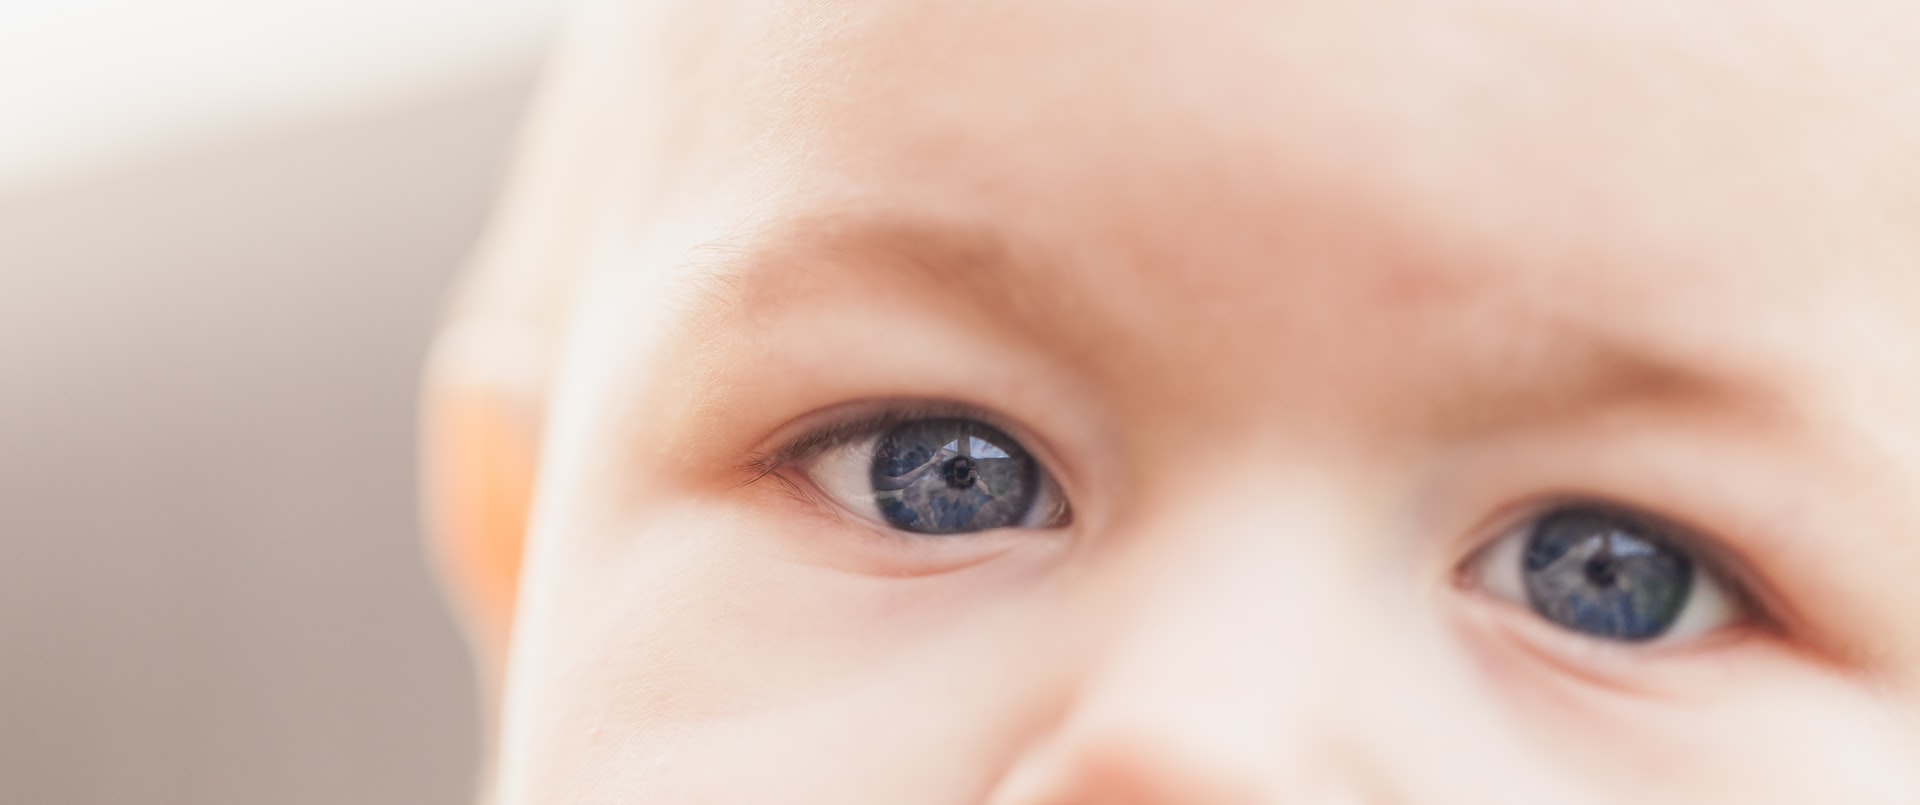 Cu bebe la oftalmolog